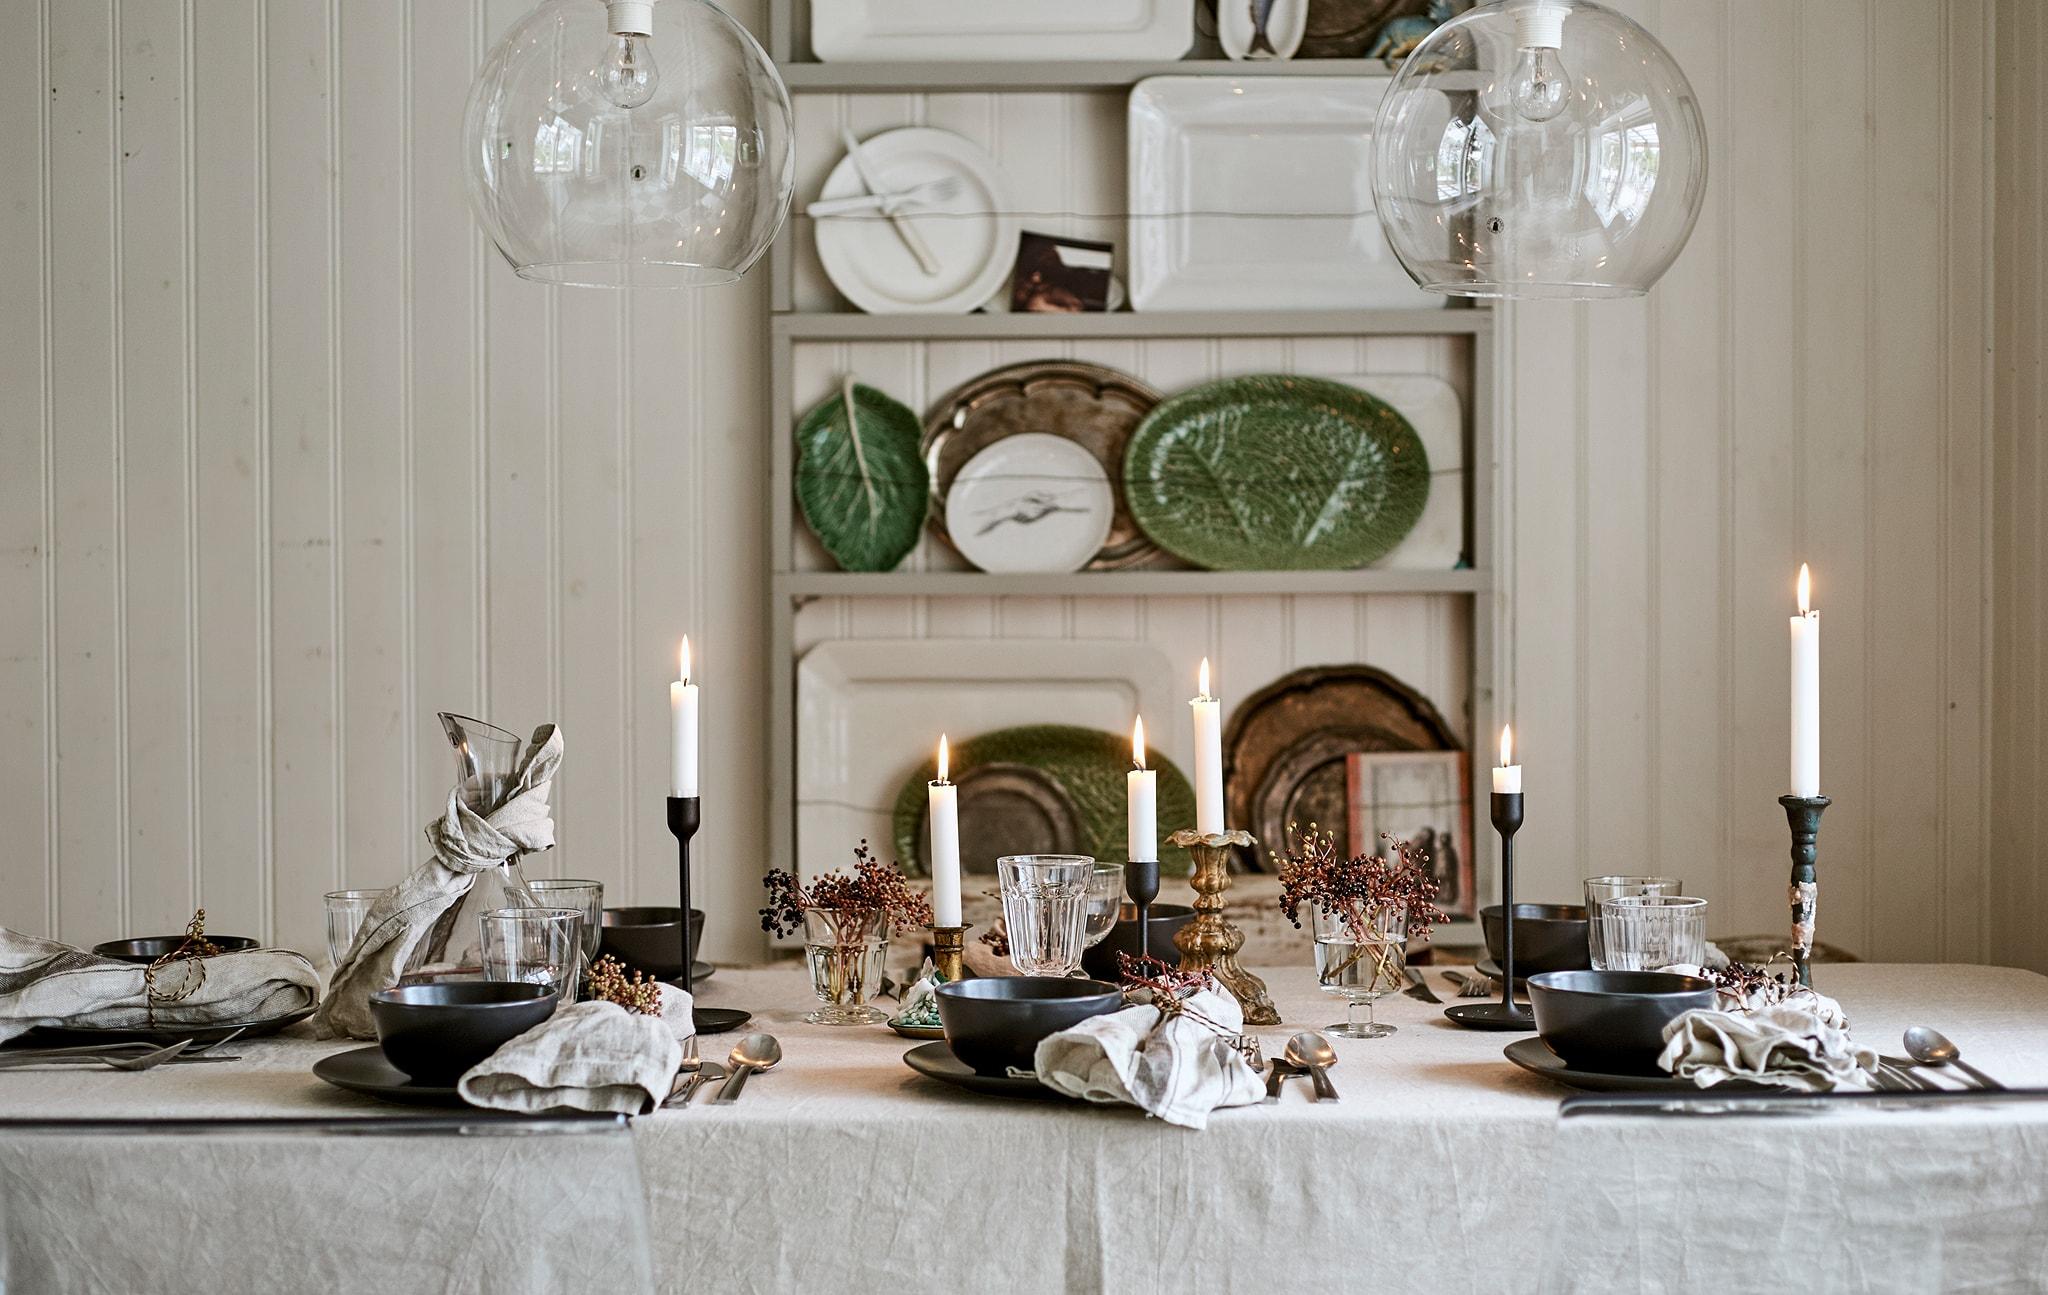 Meja makan yang ditata meriah dengan taplak meja linen, lilin, gelas-gelas kaca dan penataan tempat duduk dengan serbet yang dihias.